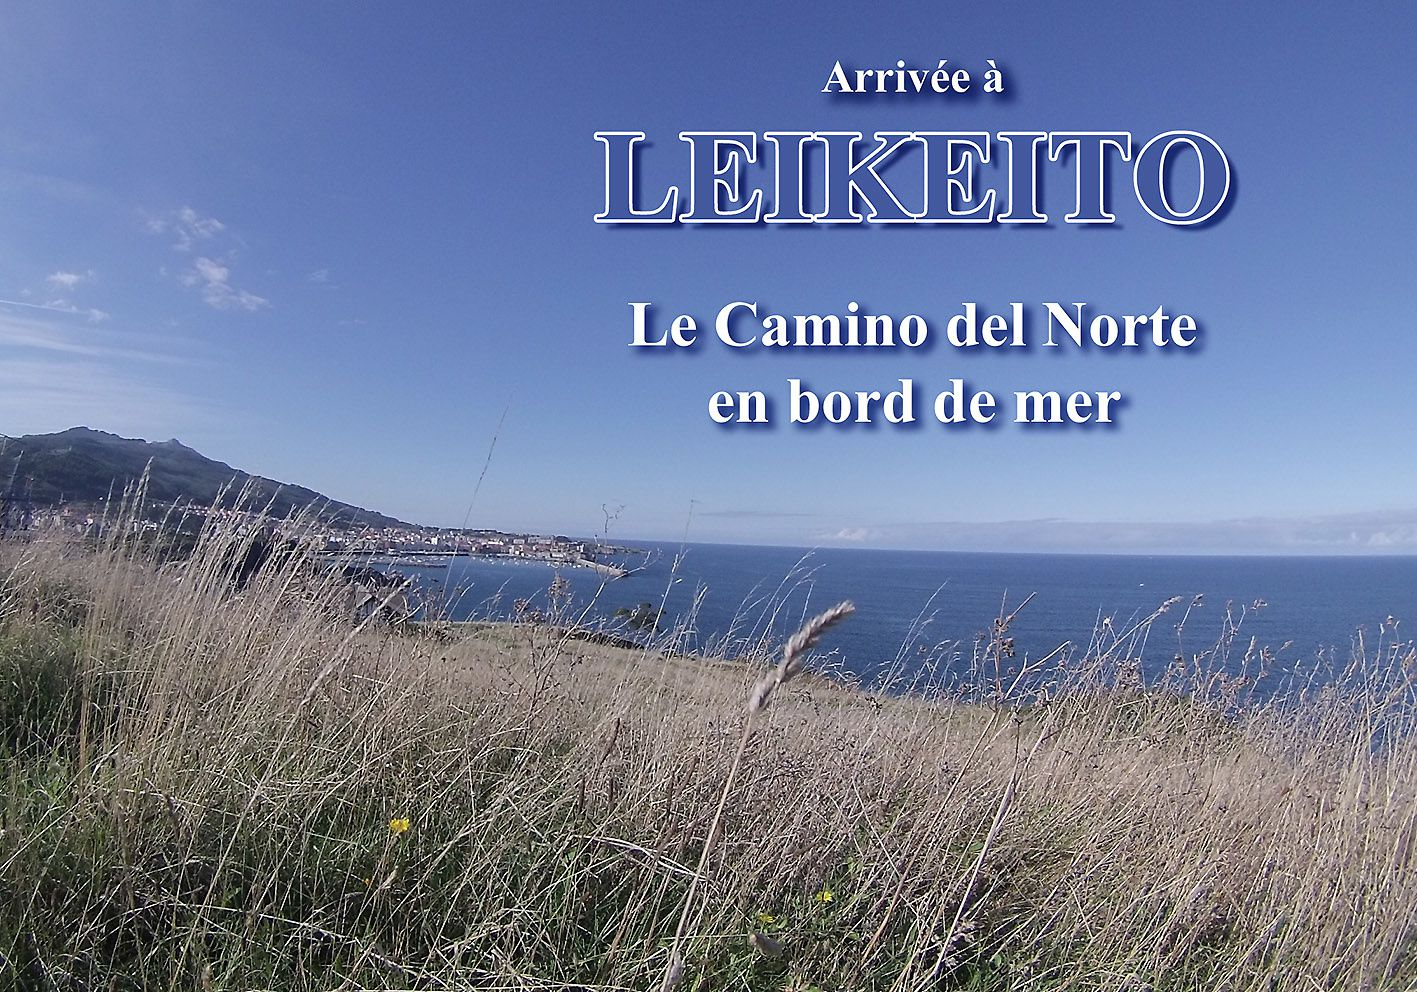 LEKEITIO, son histoire, son implantation, ses particularités ( EUSKADI - Pays Basques - Espana )